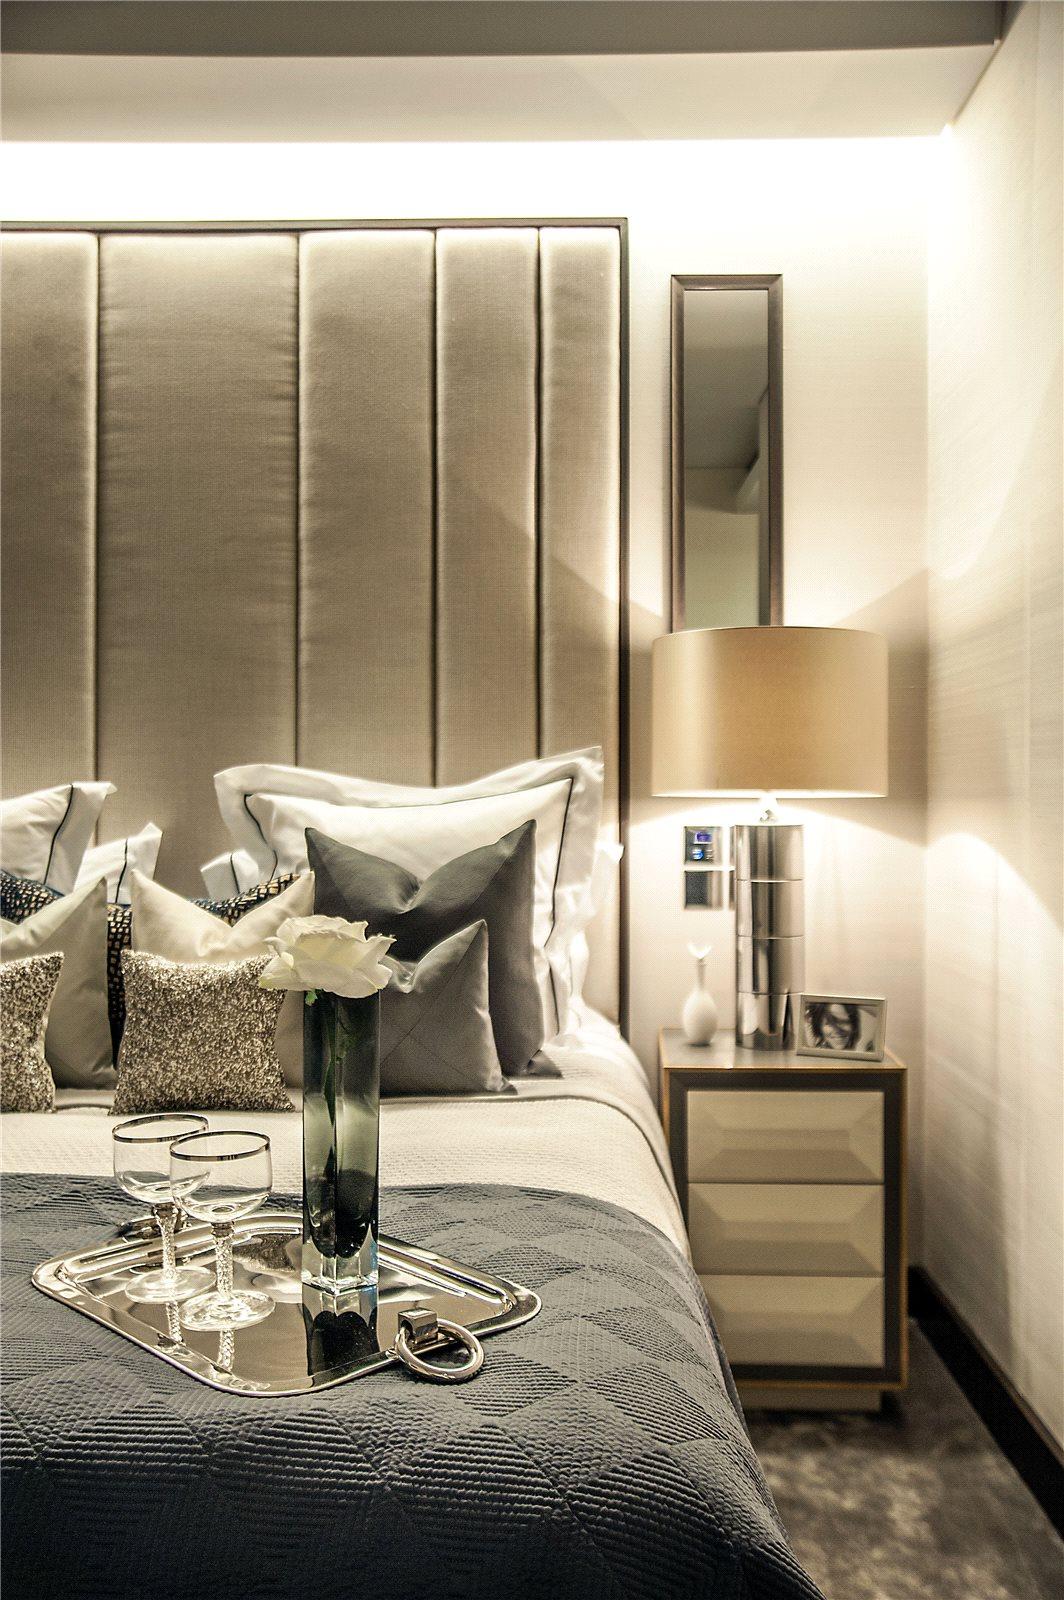 One Hyde Park, Knightsbridge, London, SW1X: a luxury home ...